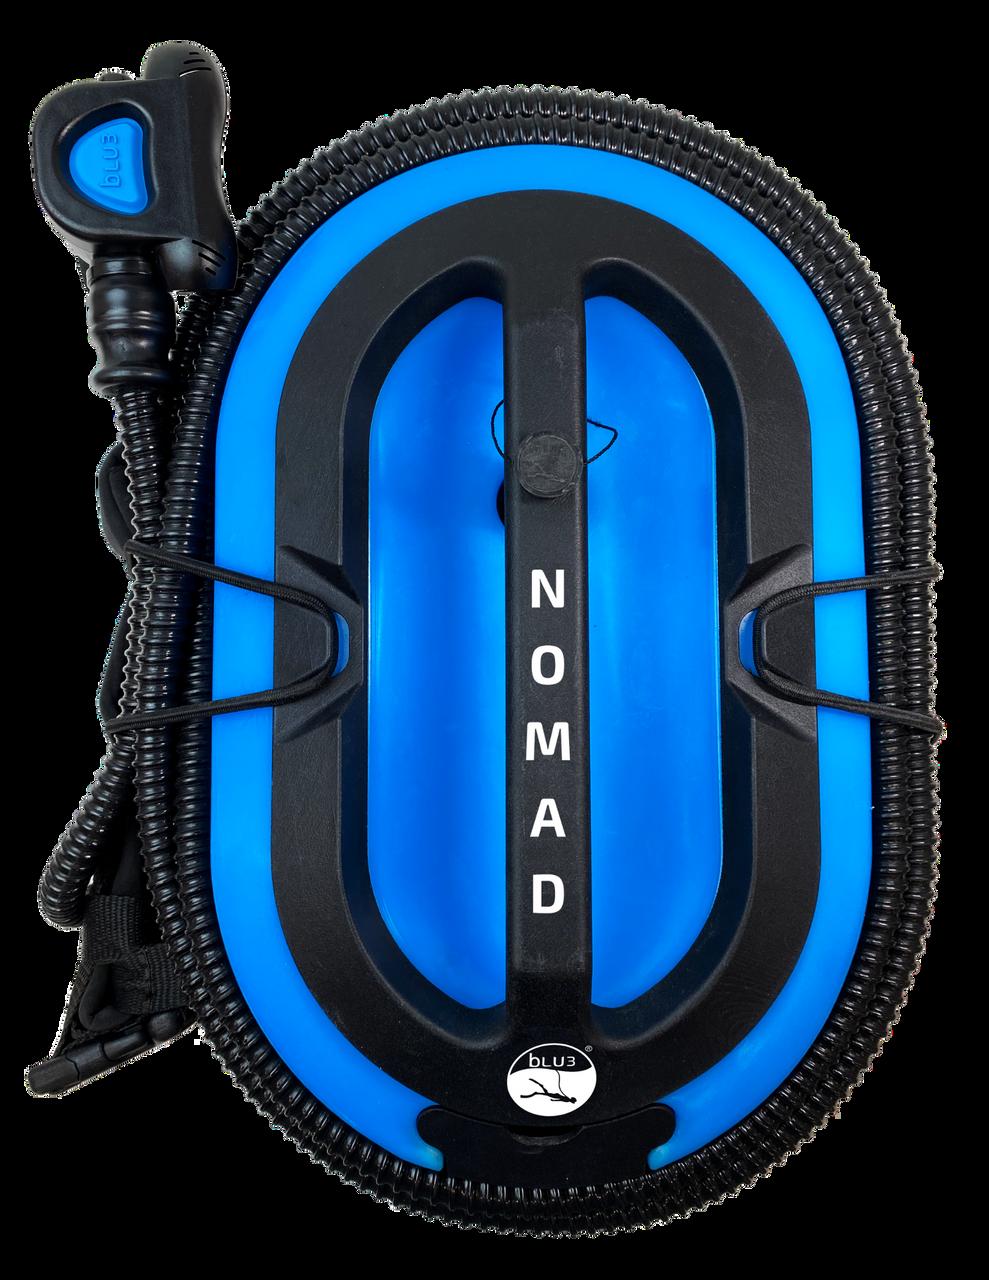 Nomad BLU3